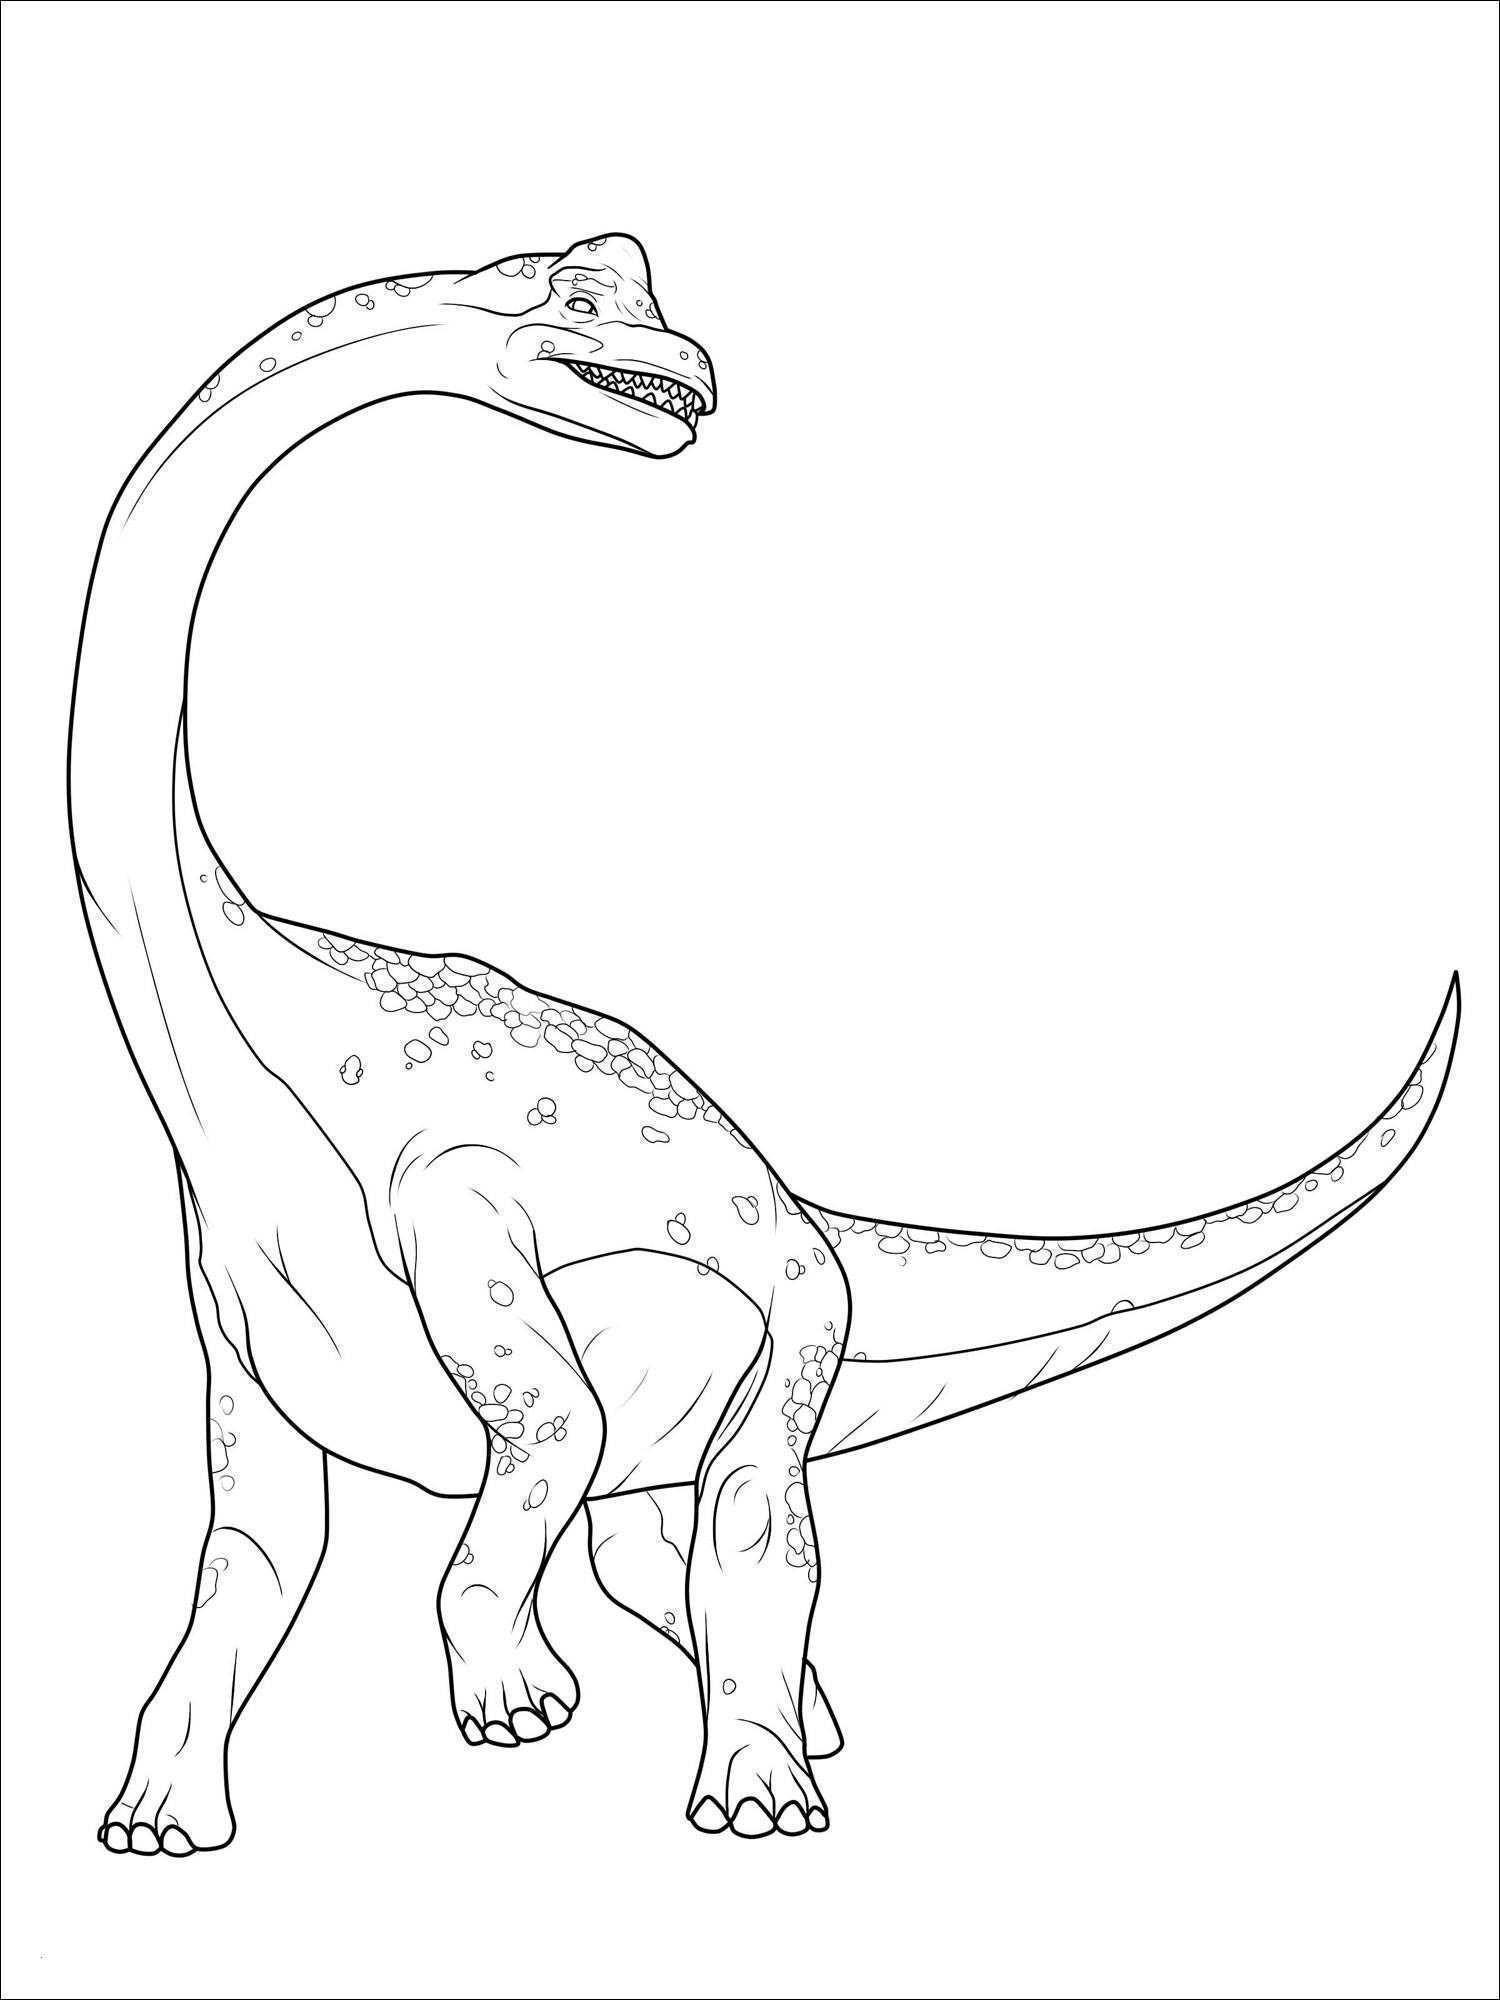 Dinosaurier Ausmalbilder Tyrannosaurus Rex Genial Malvorlage Dinosaurier Ausmalbilder Aufnahme Bayern Ausmalbilder Neu Sammlung